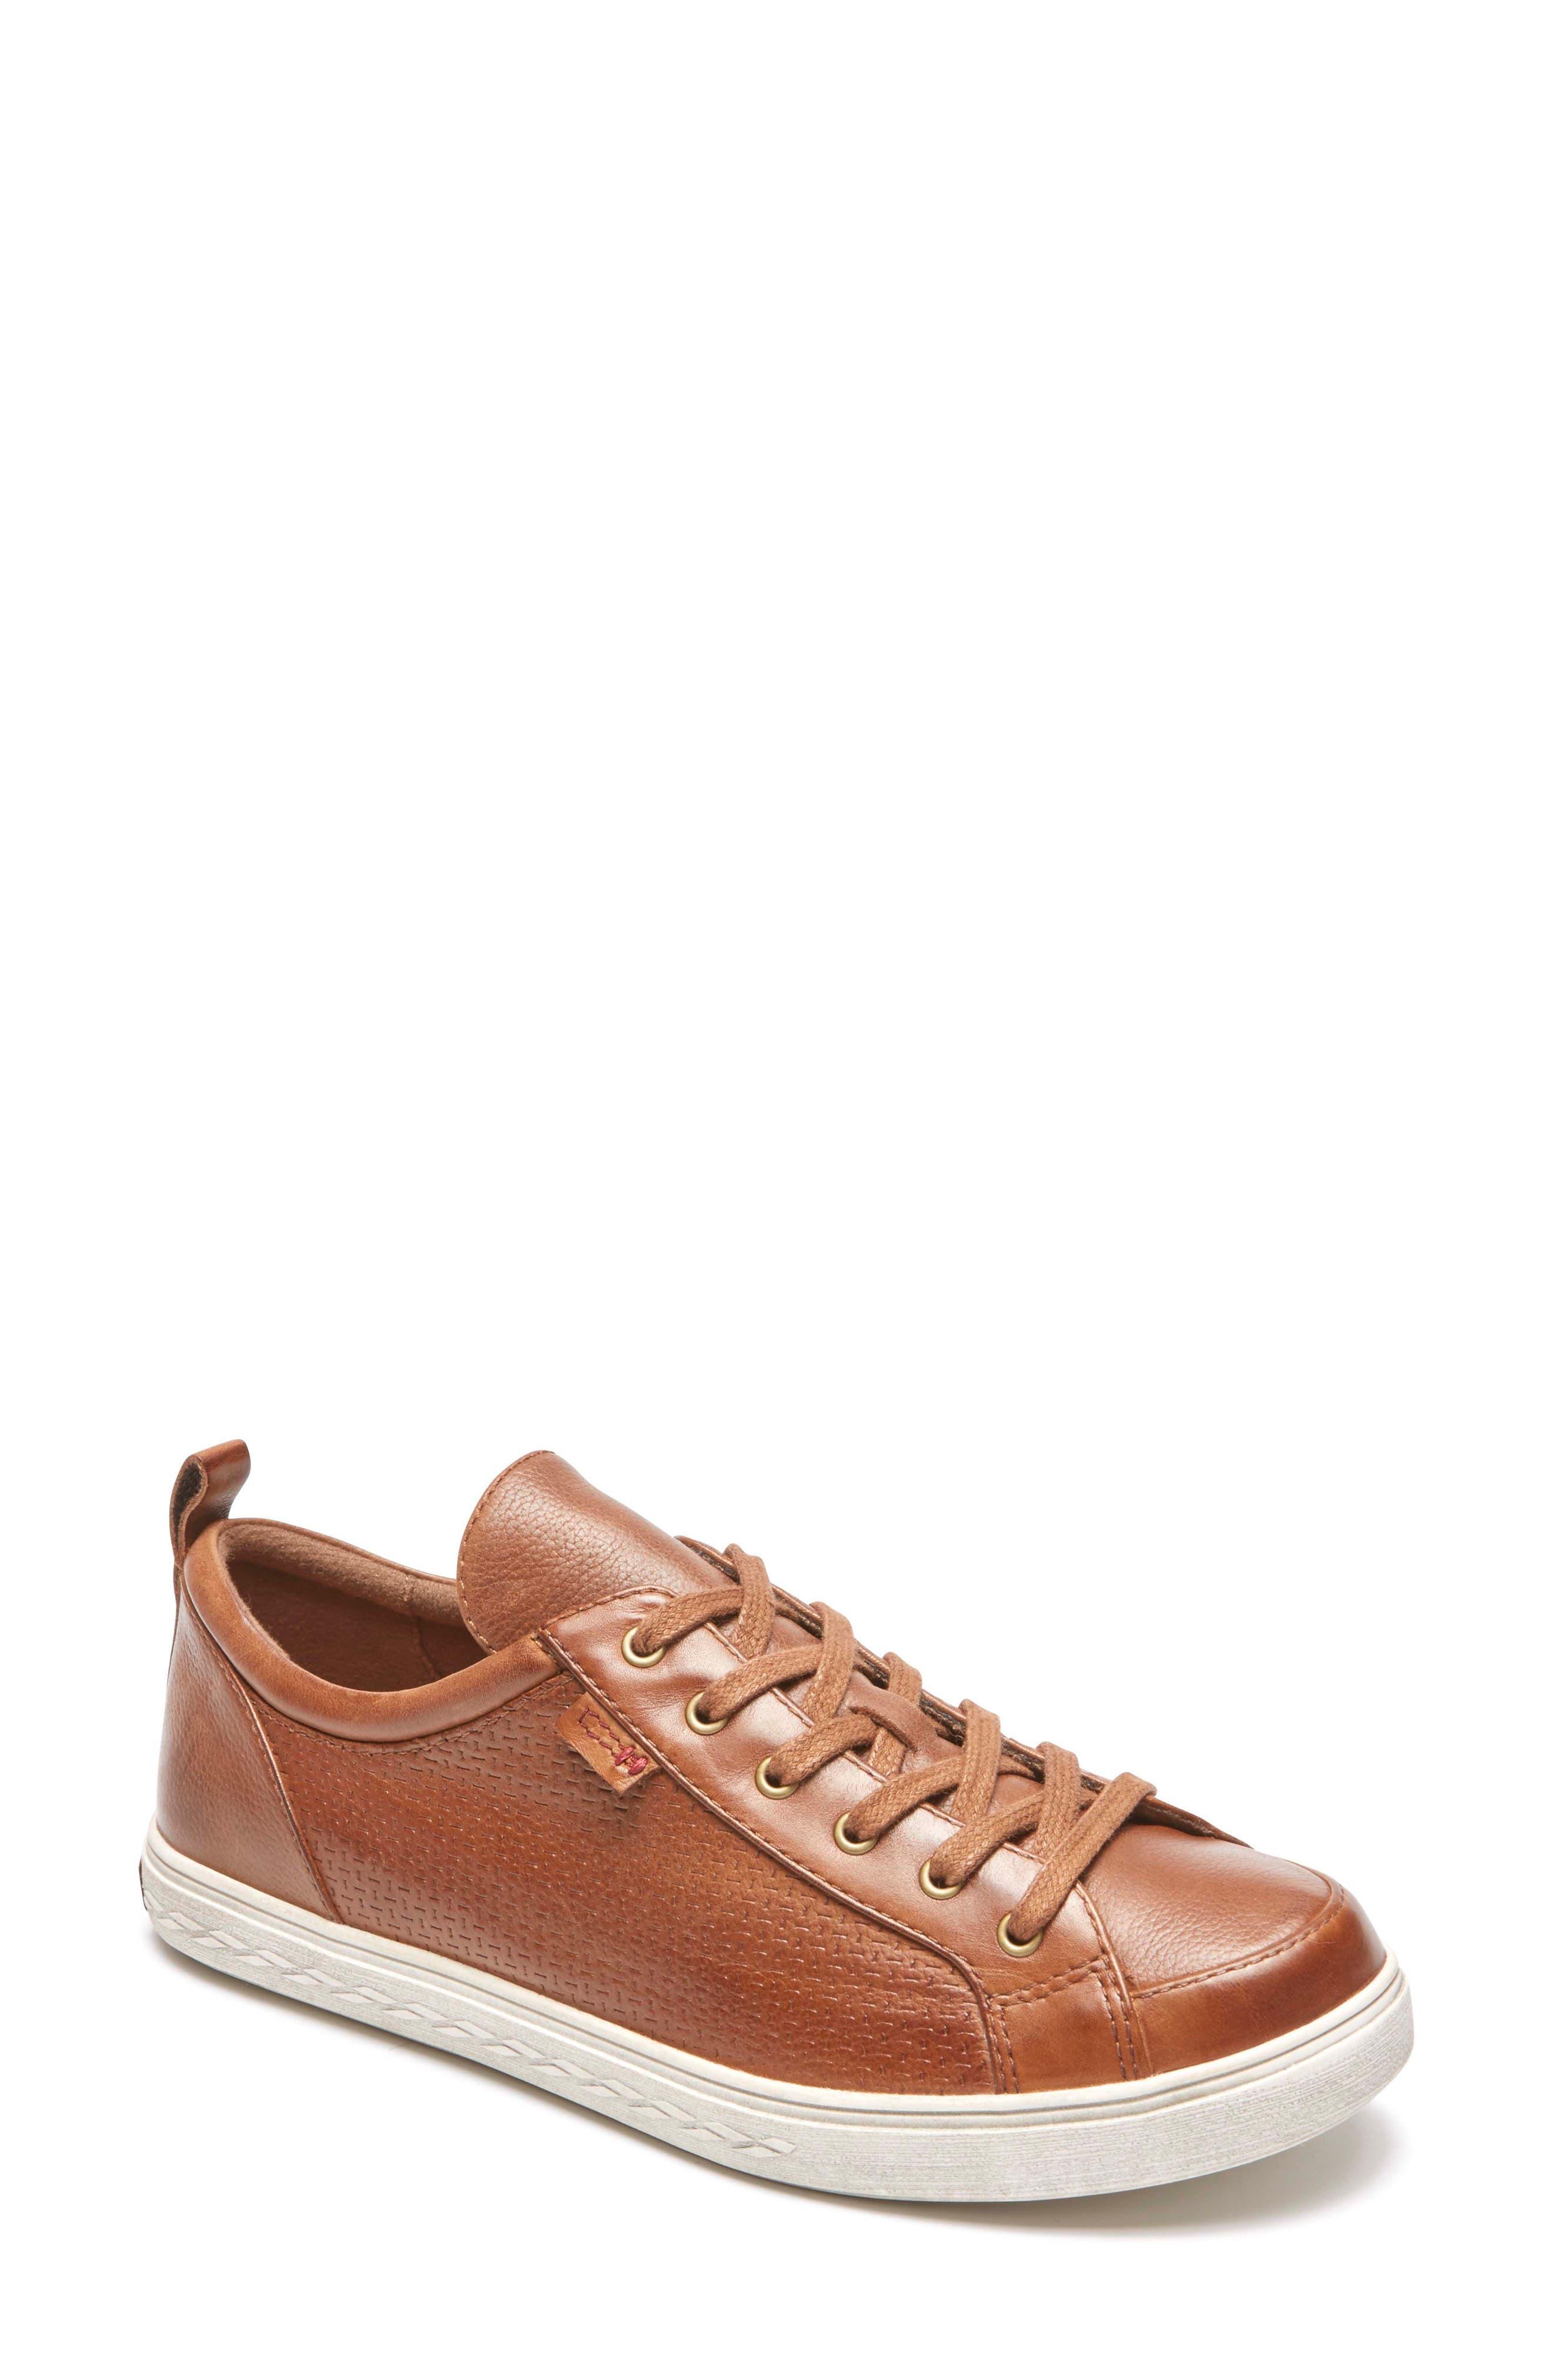 Willa Sneaker,                         Main,                         color, Almond Leather